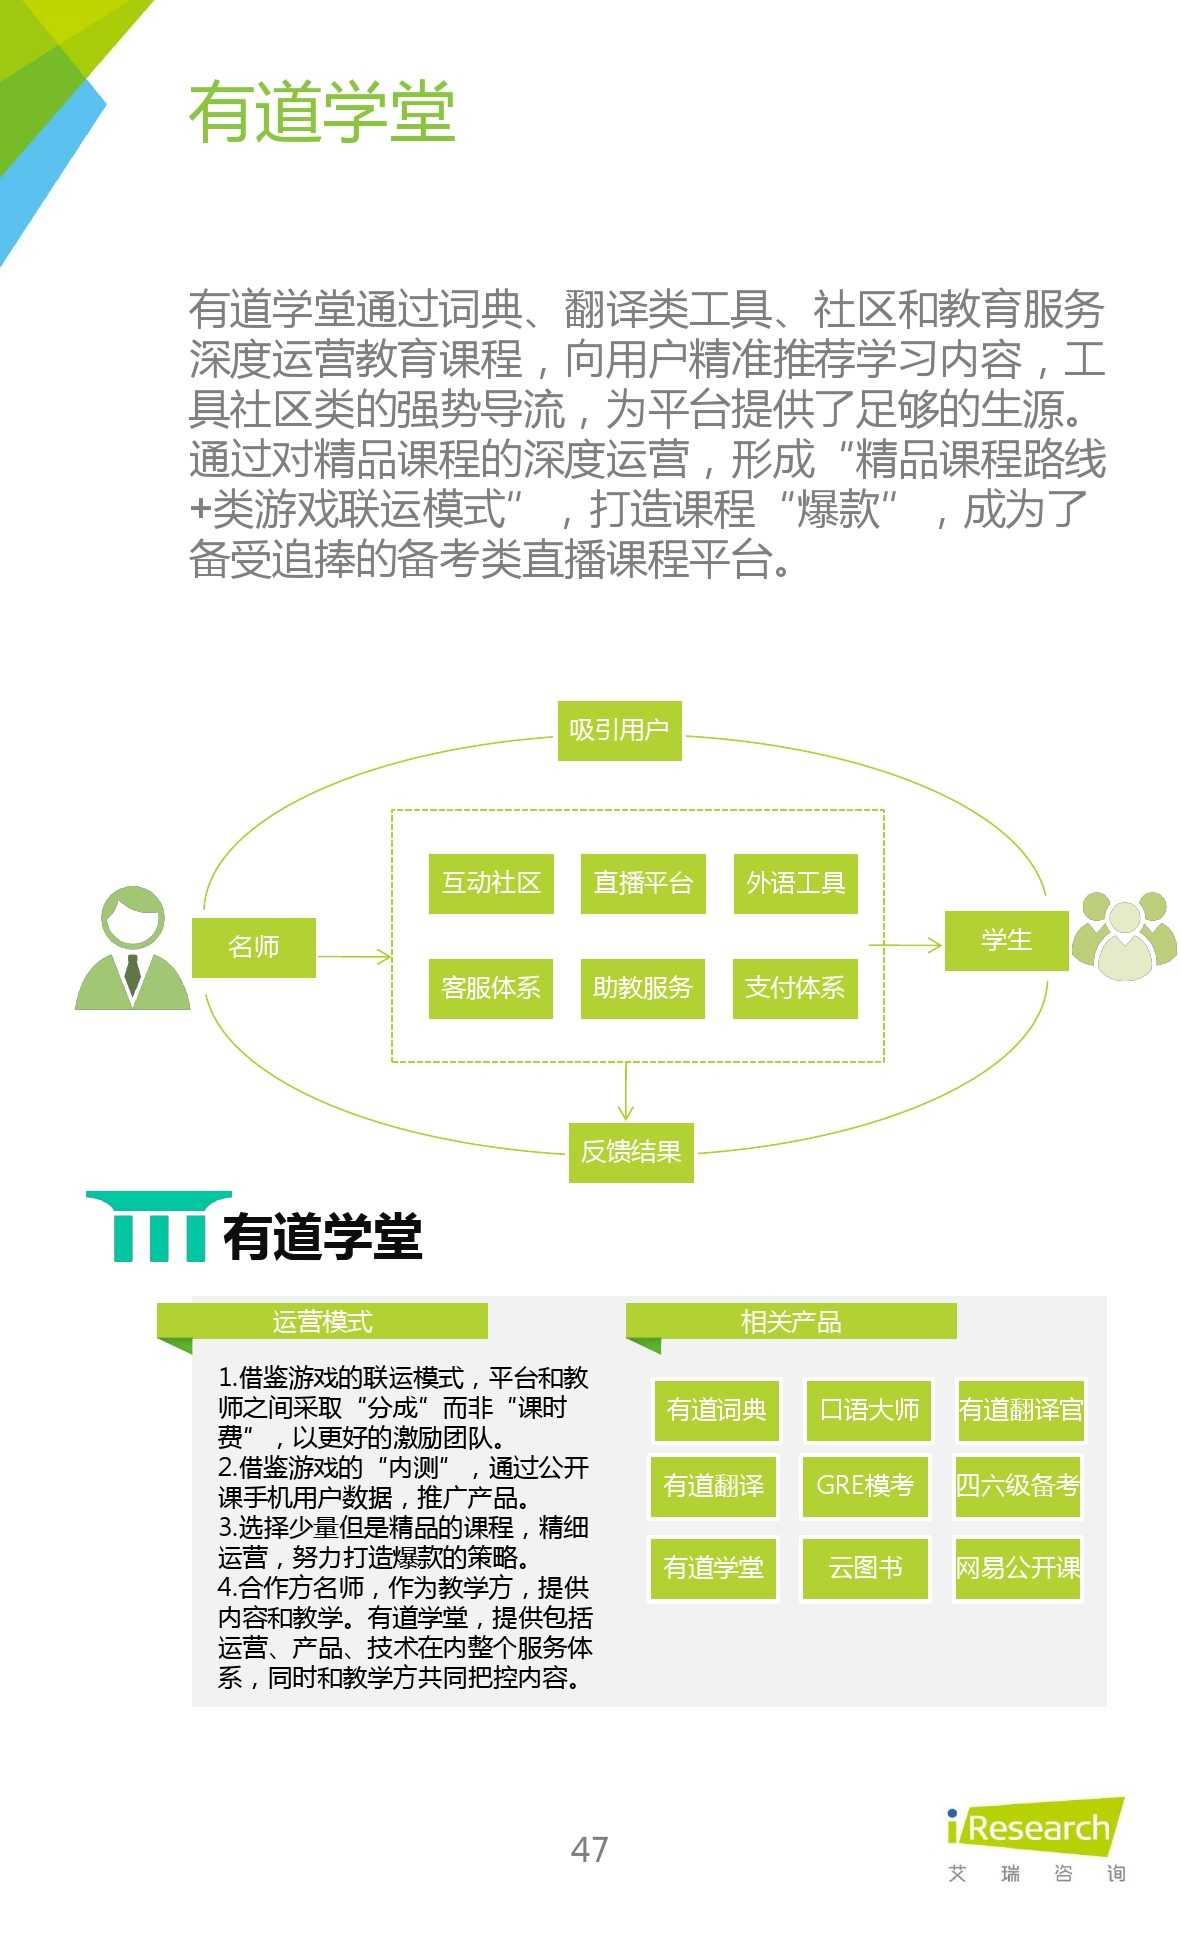 iResearch-2015年中国在线教育平台研究报告_000047